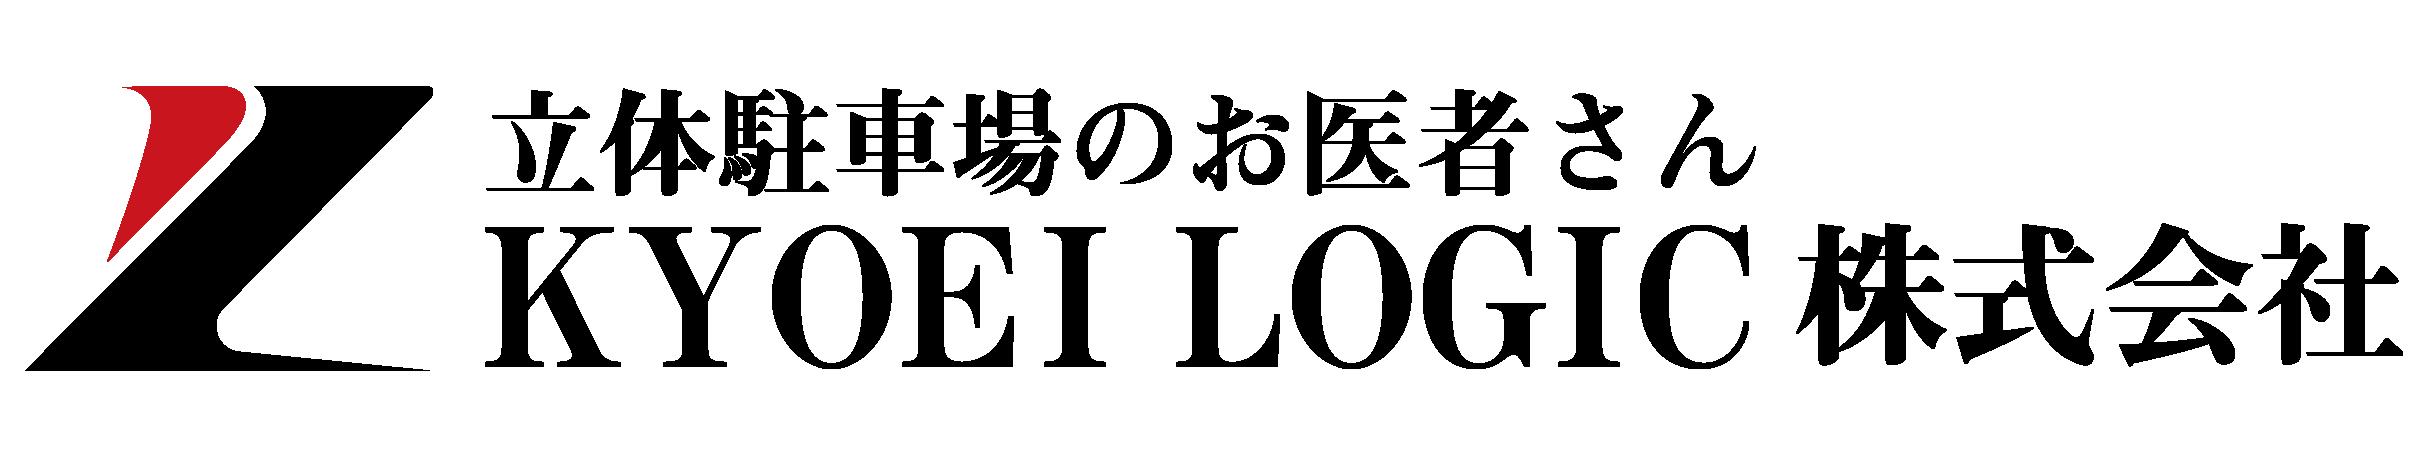 KYOEI LOGIC株式会社